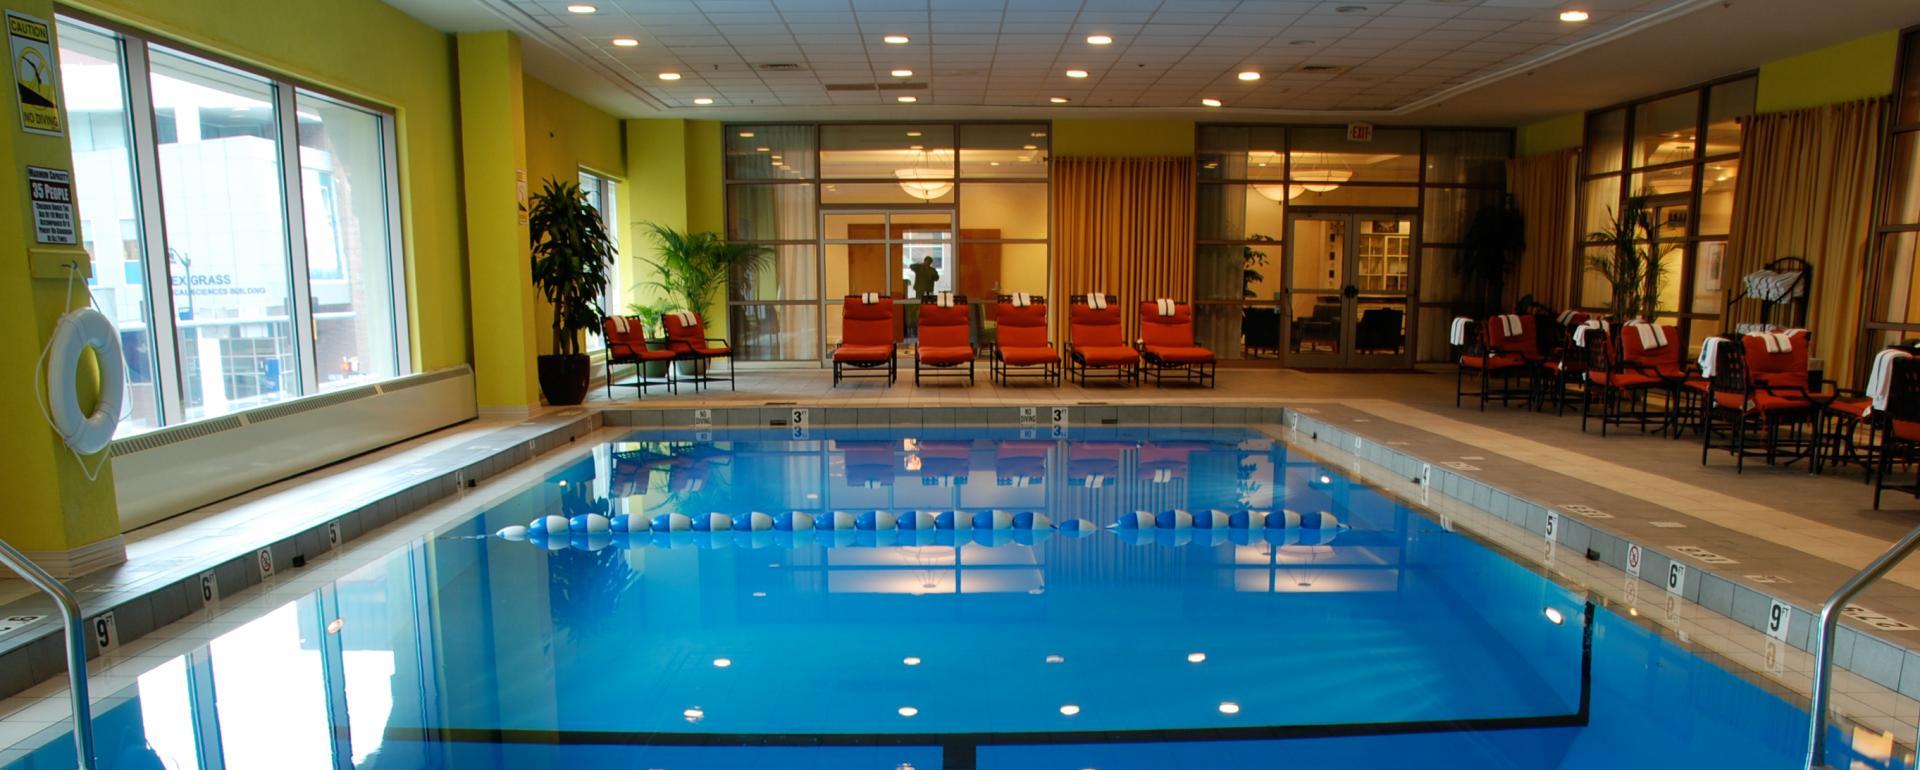 Hotels in Harrisburg